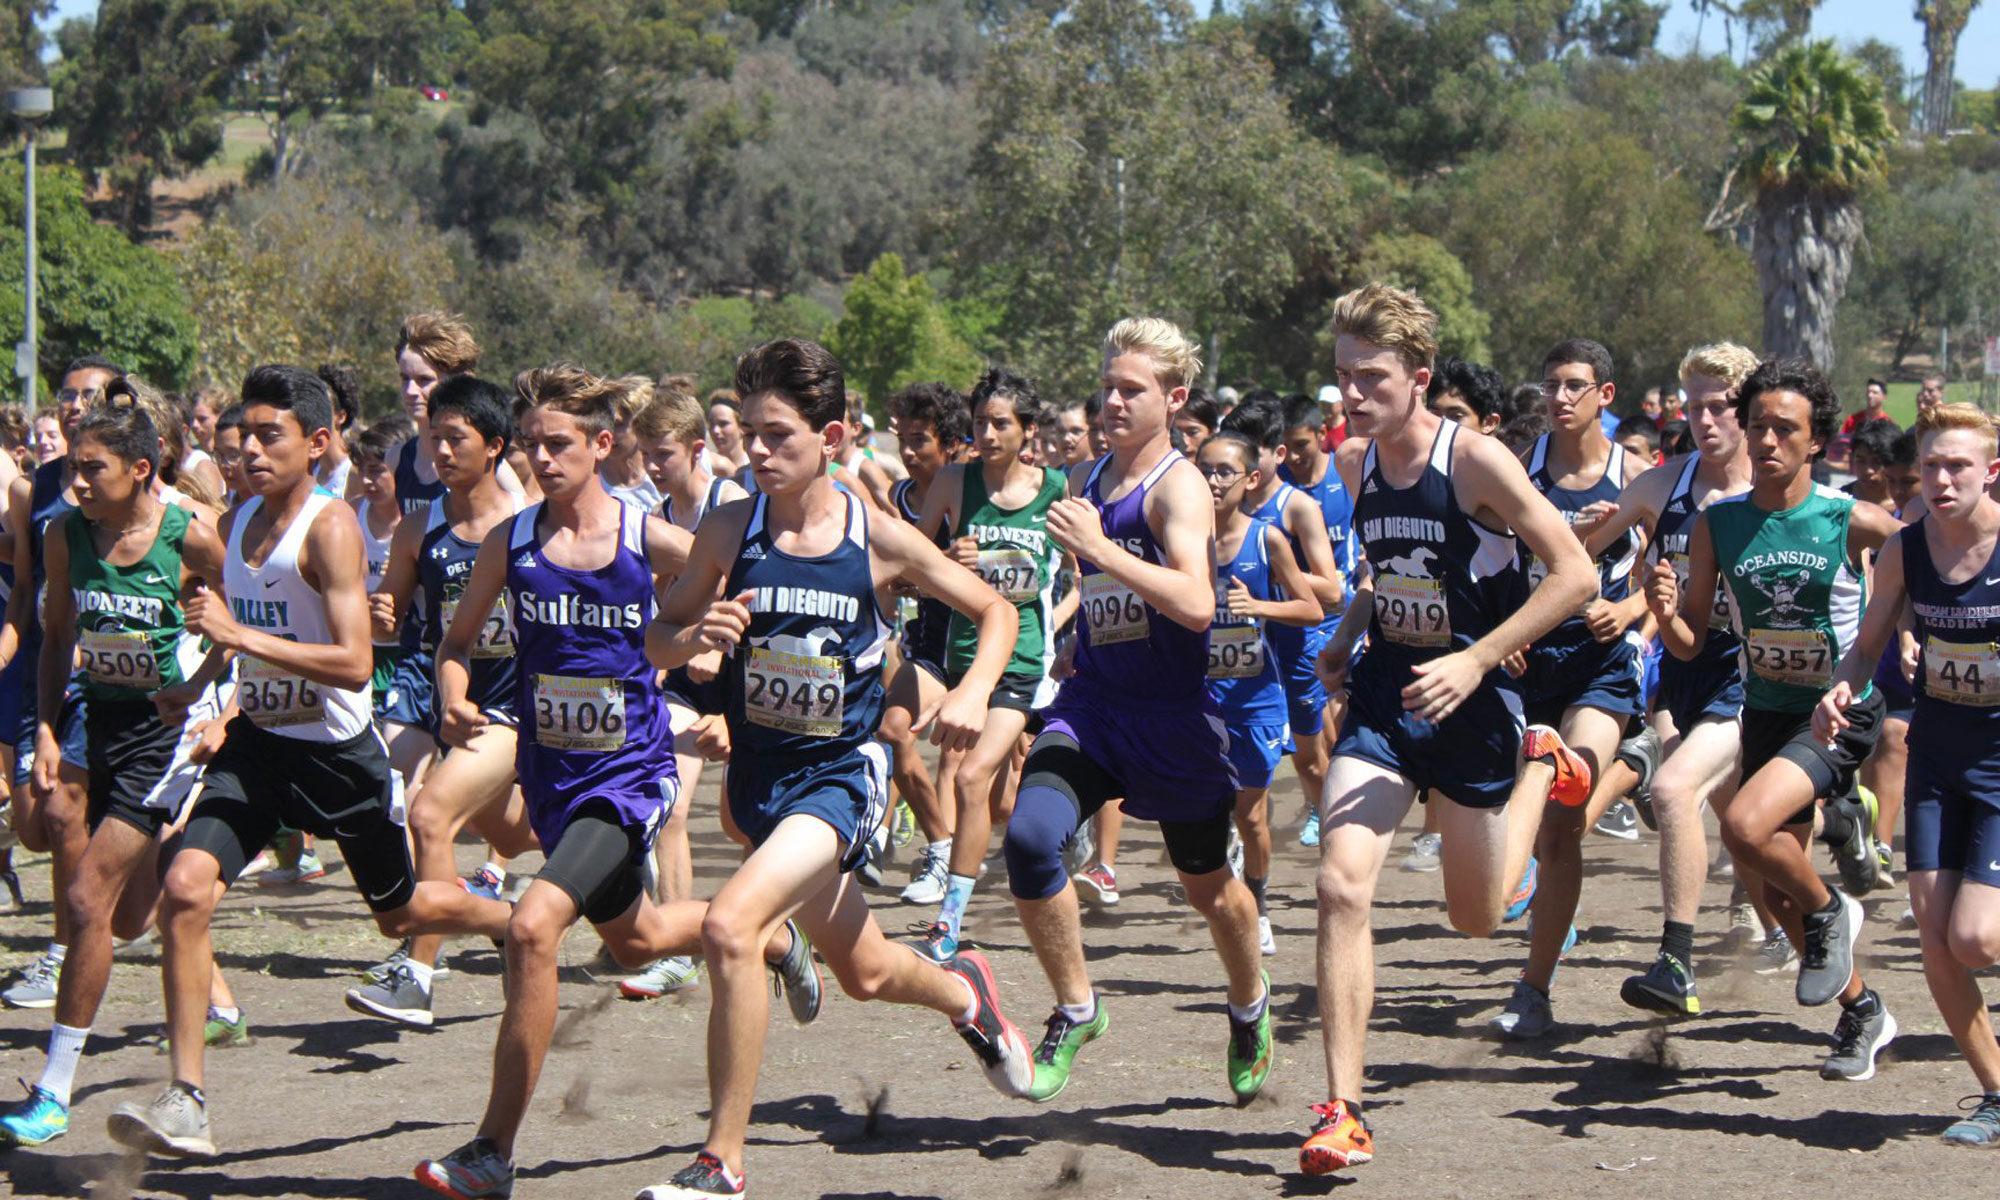 Team members run in a race